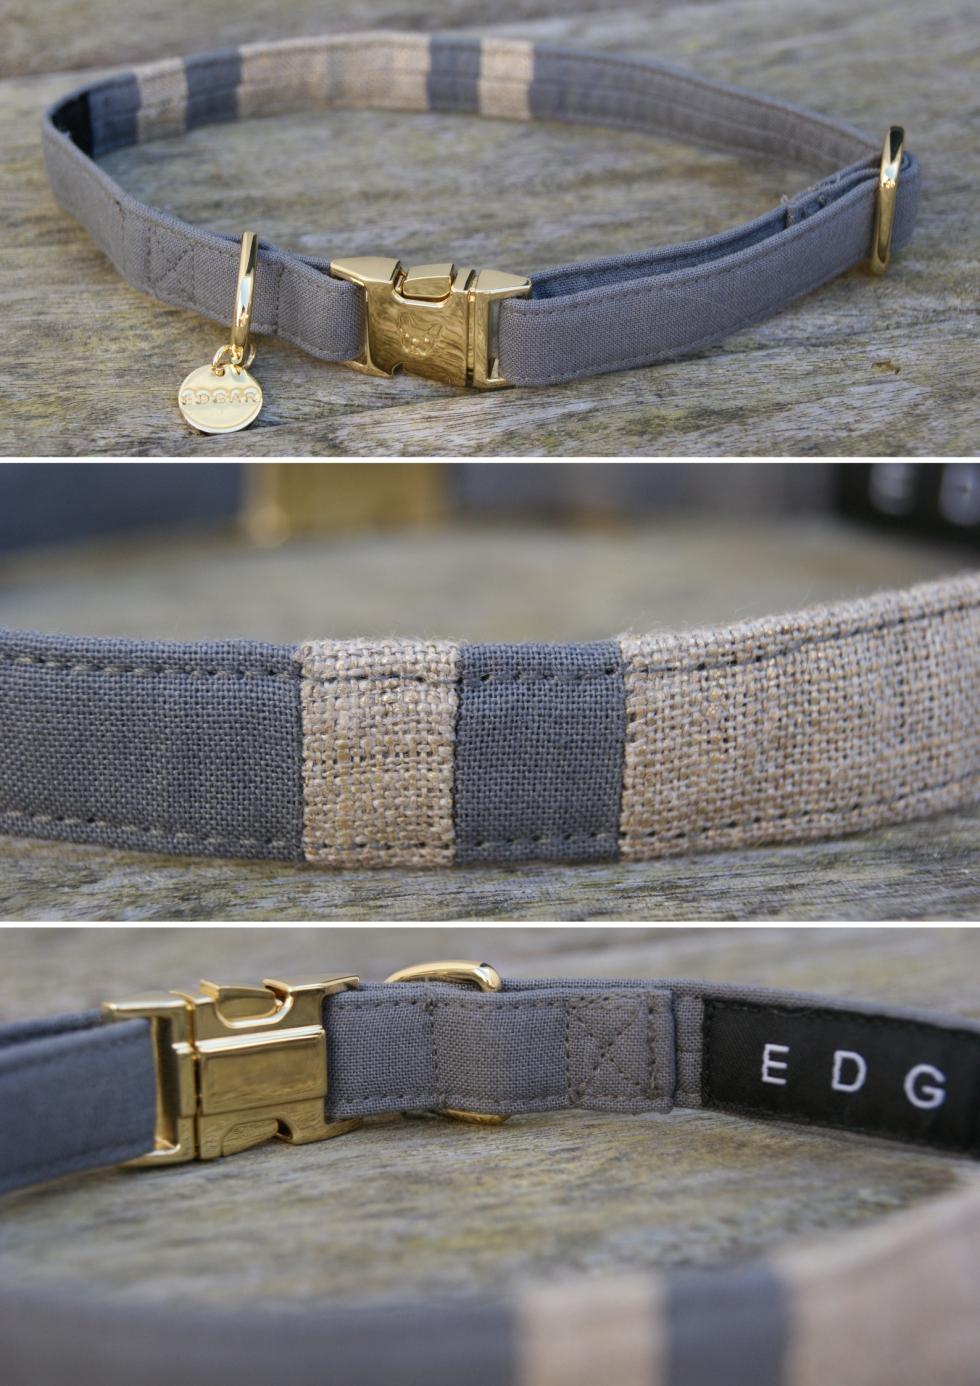 edgar (2)